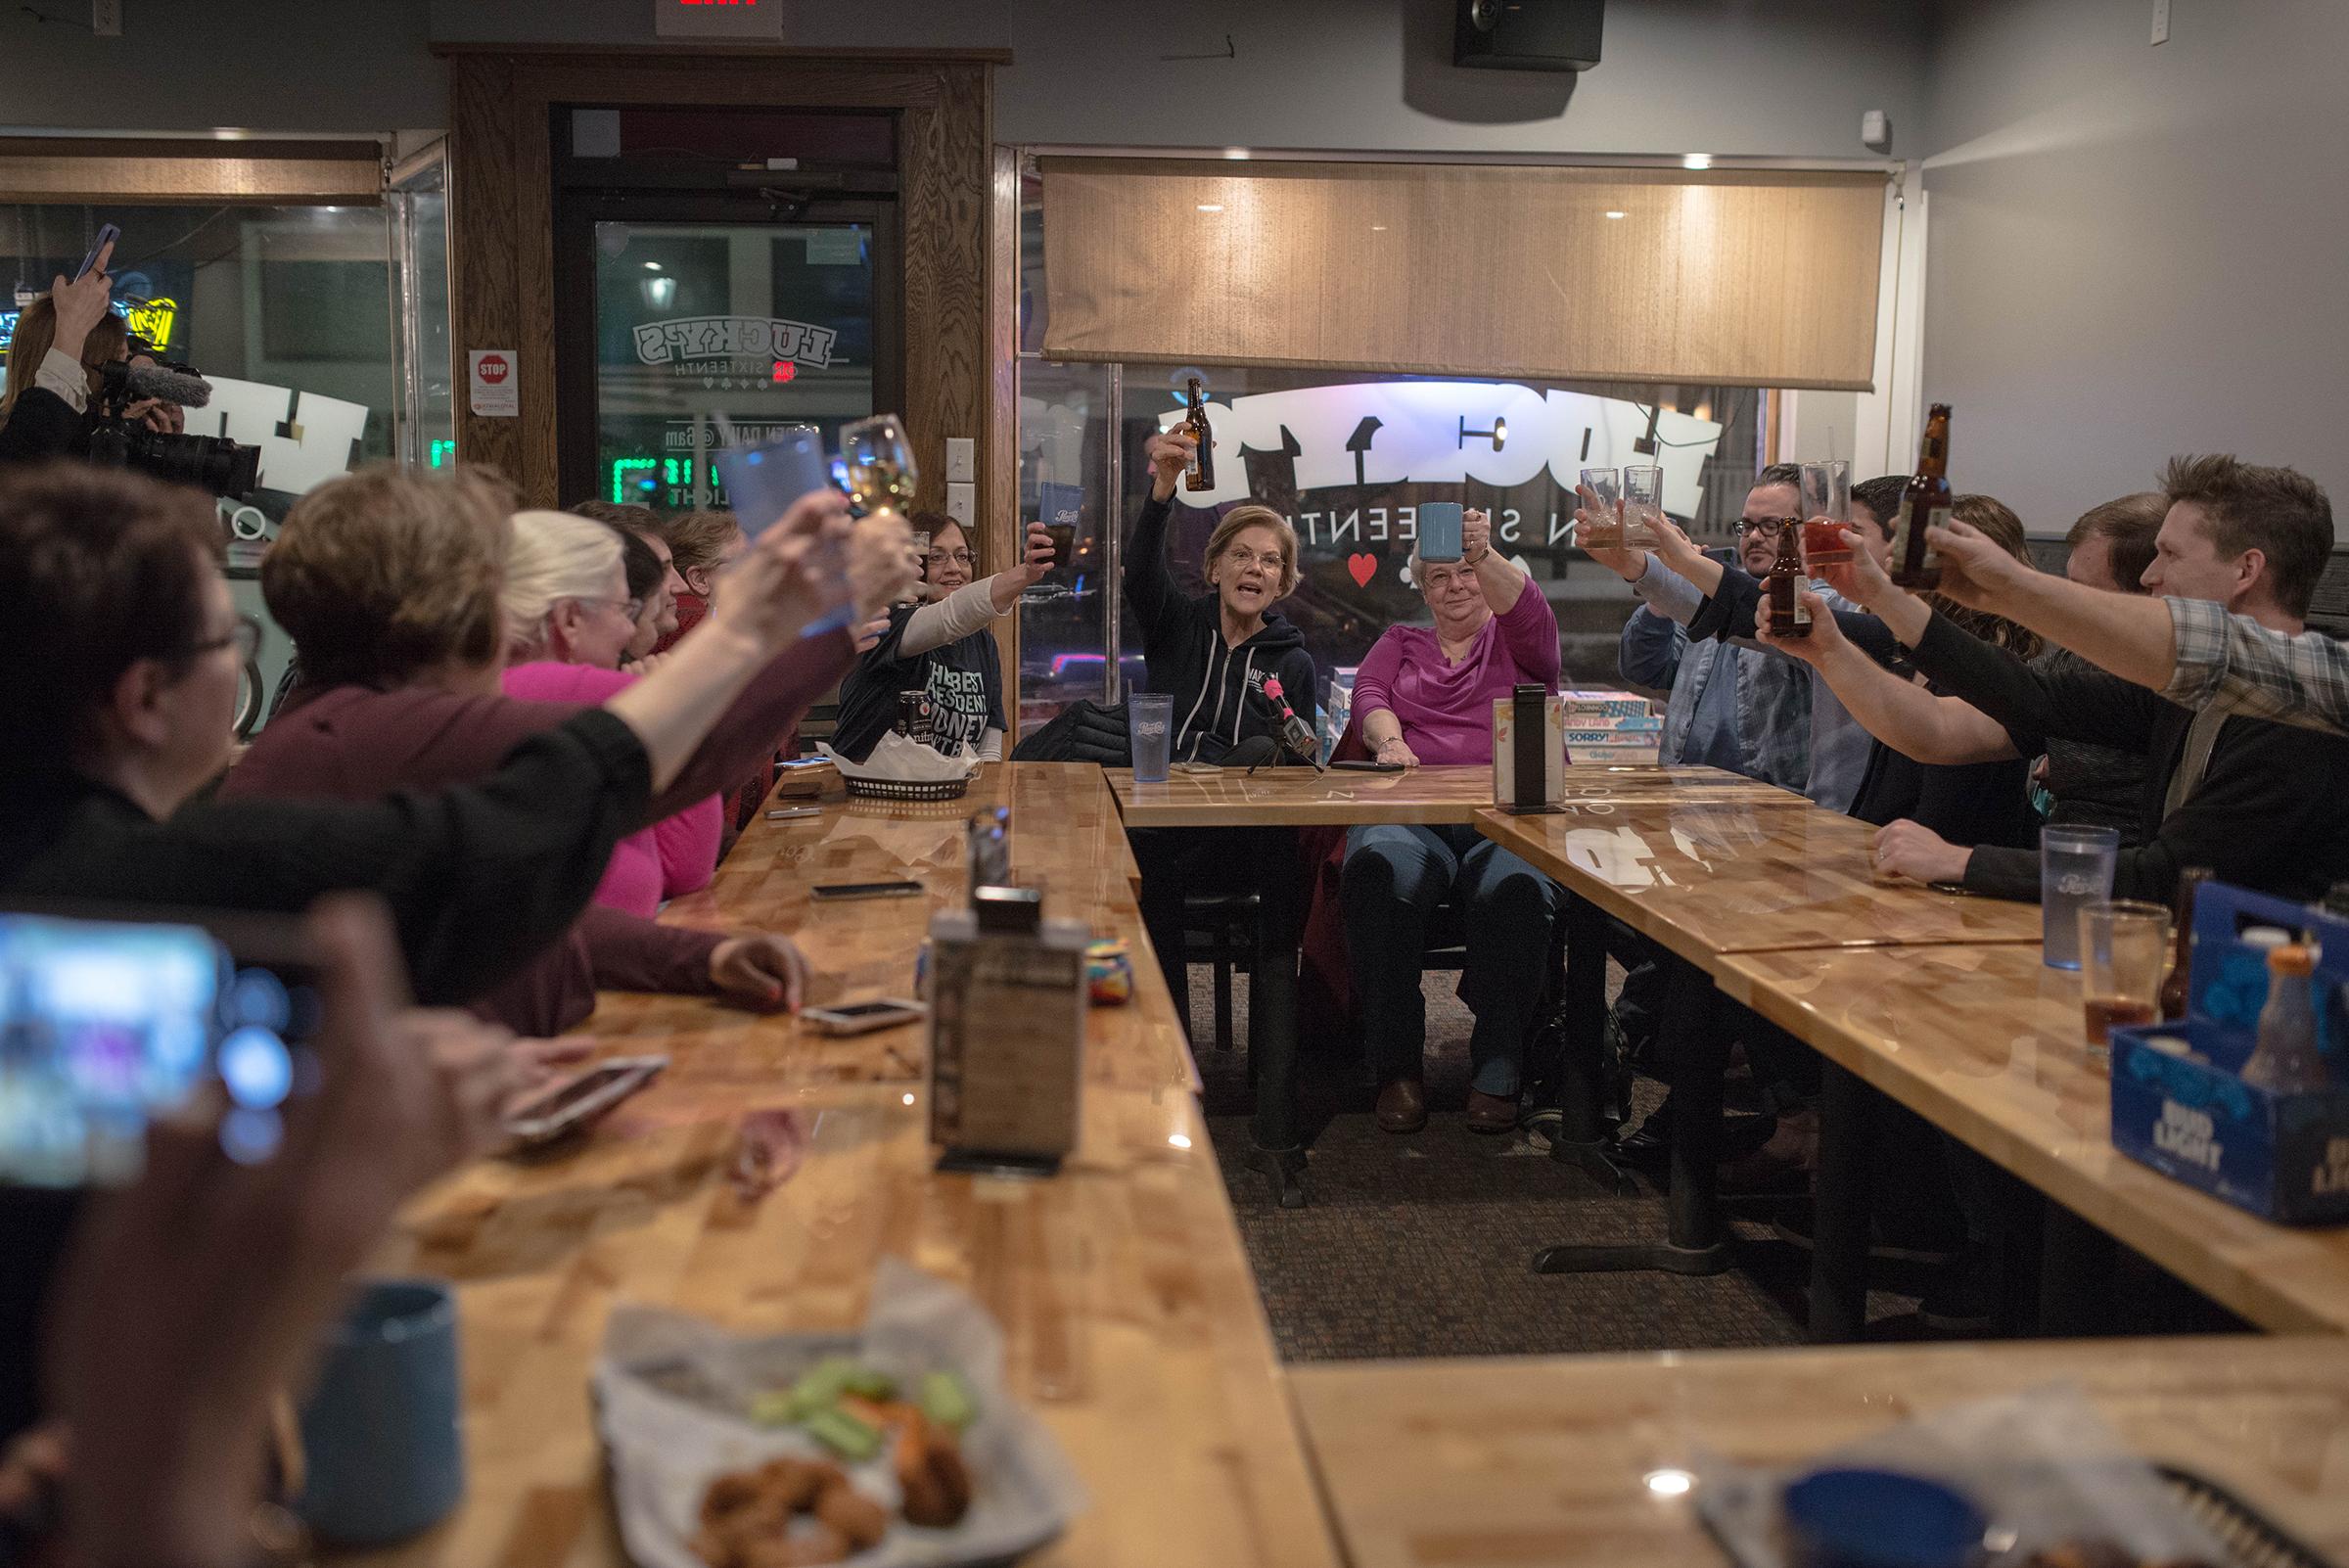 Sen. Elizabeth Warren holds a meet-and-greet at a pub in Cedar Rapids, Iowa, on Jan. 26.